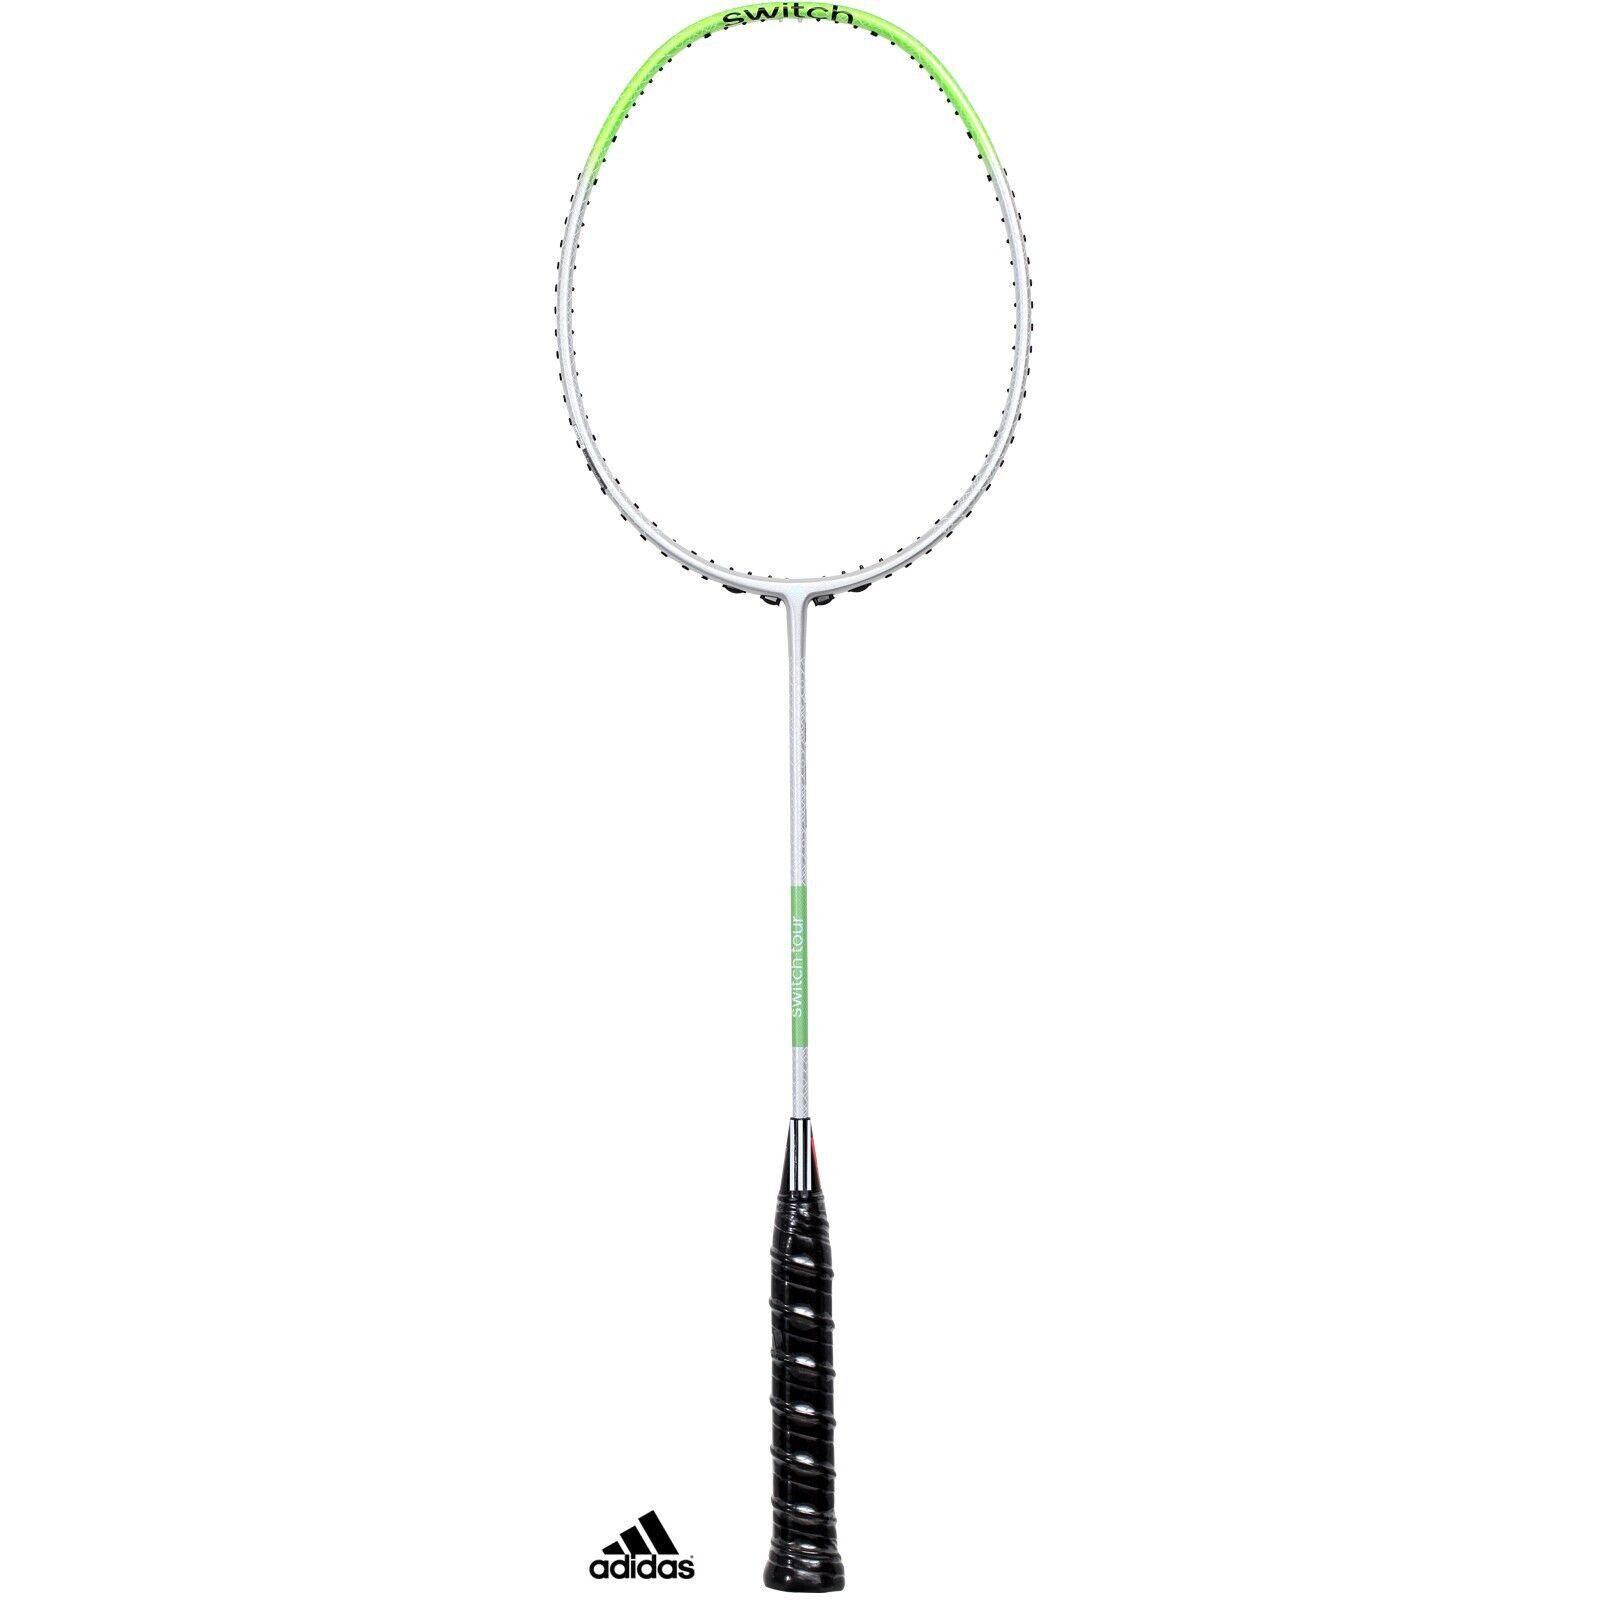 Adidas Badminton Switch Series TOUR Racket - Free string!